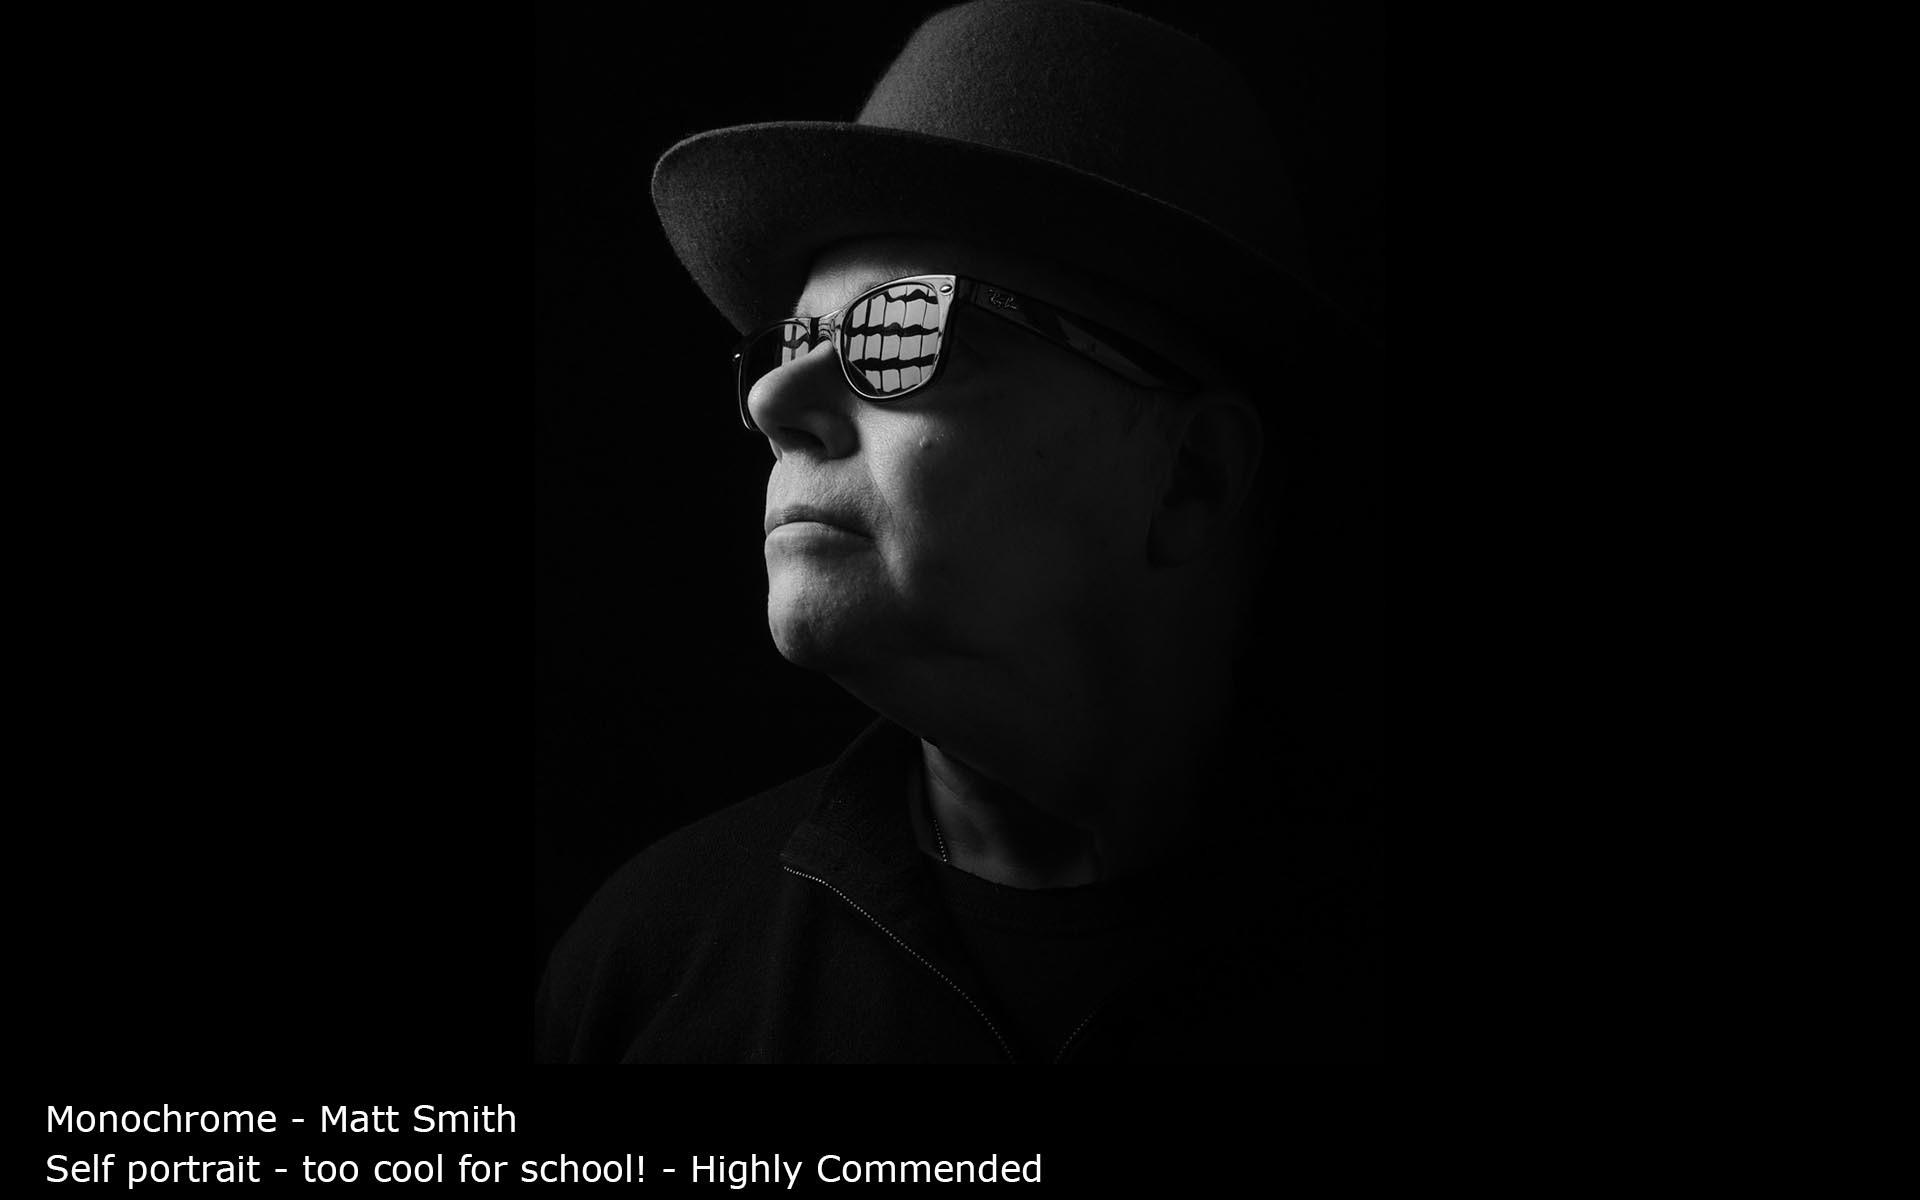 Self portrait - too cool for school! - Matt Smith